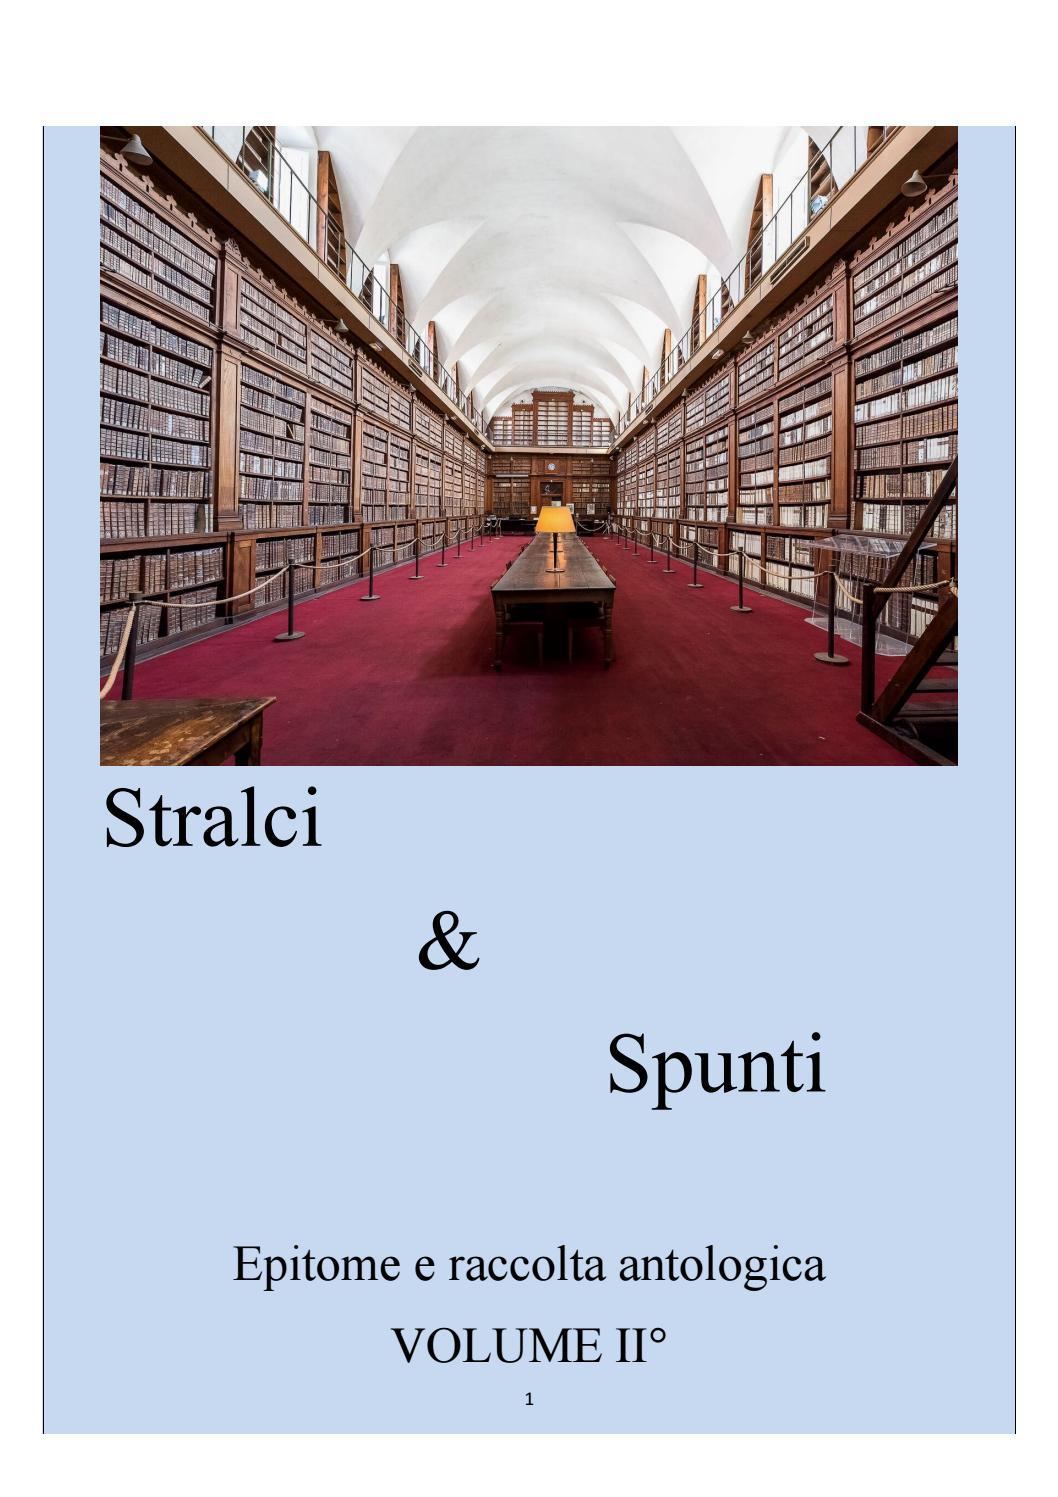 05fe9462c8 Stralci & Spunti VOLUME II° by stralciespunti - issuu